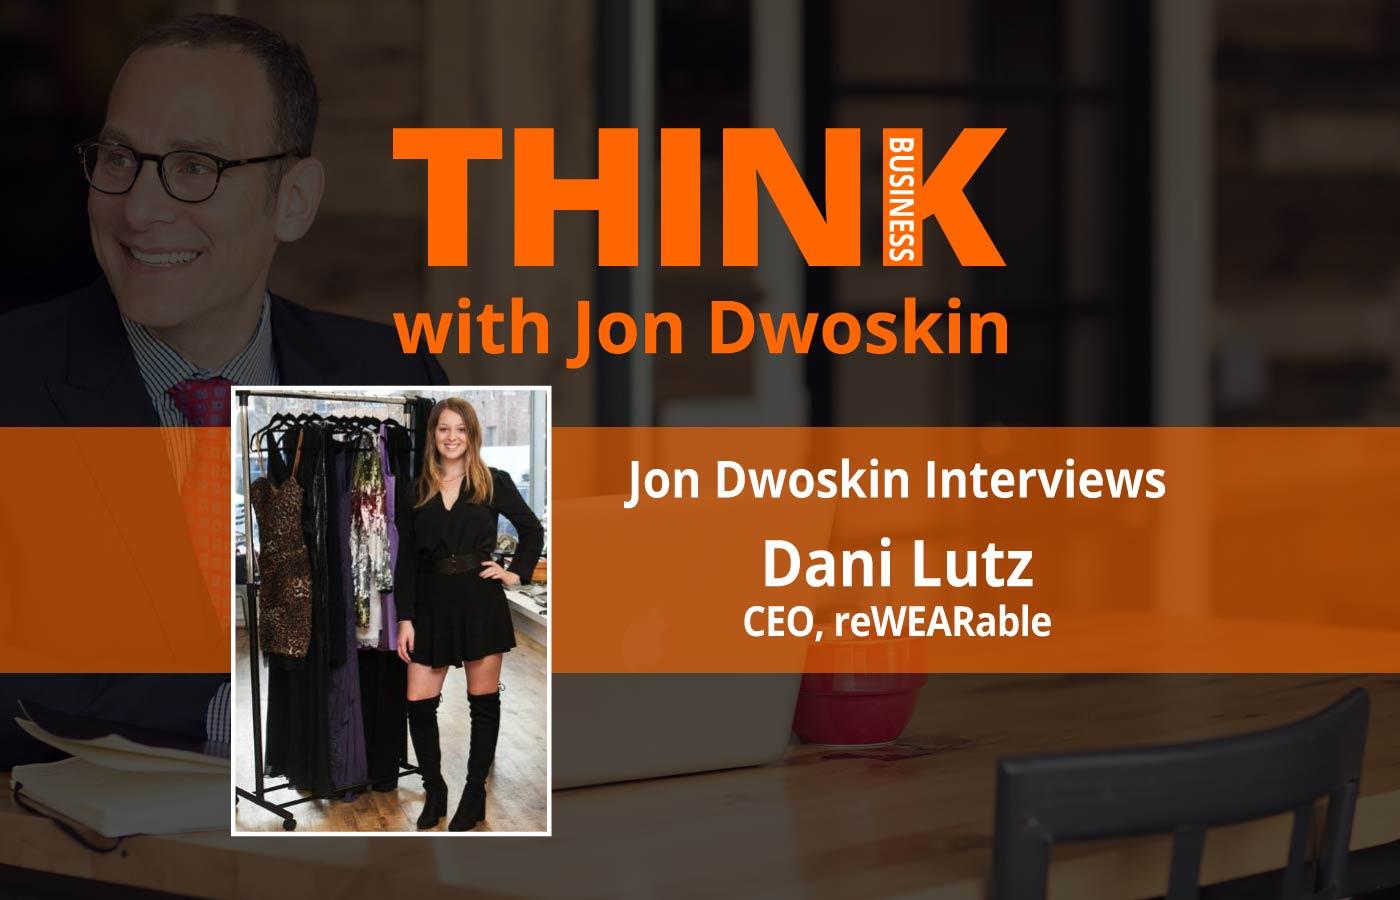 THINK Business: Jon Dwoskin Interviews Dani Lutz, CEO reWEARable